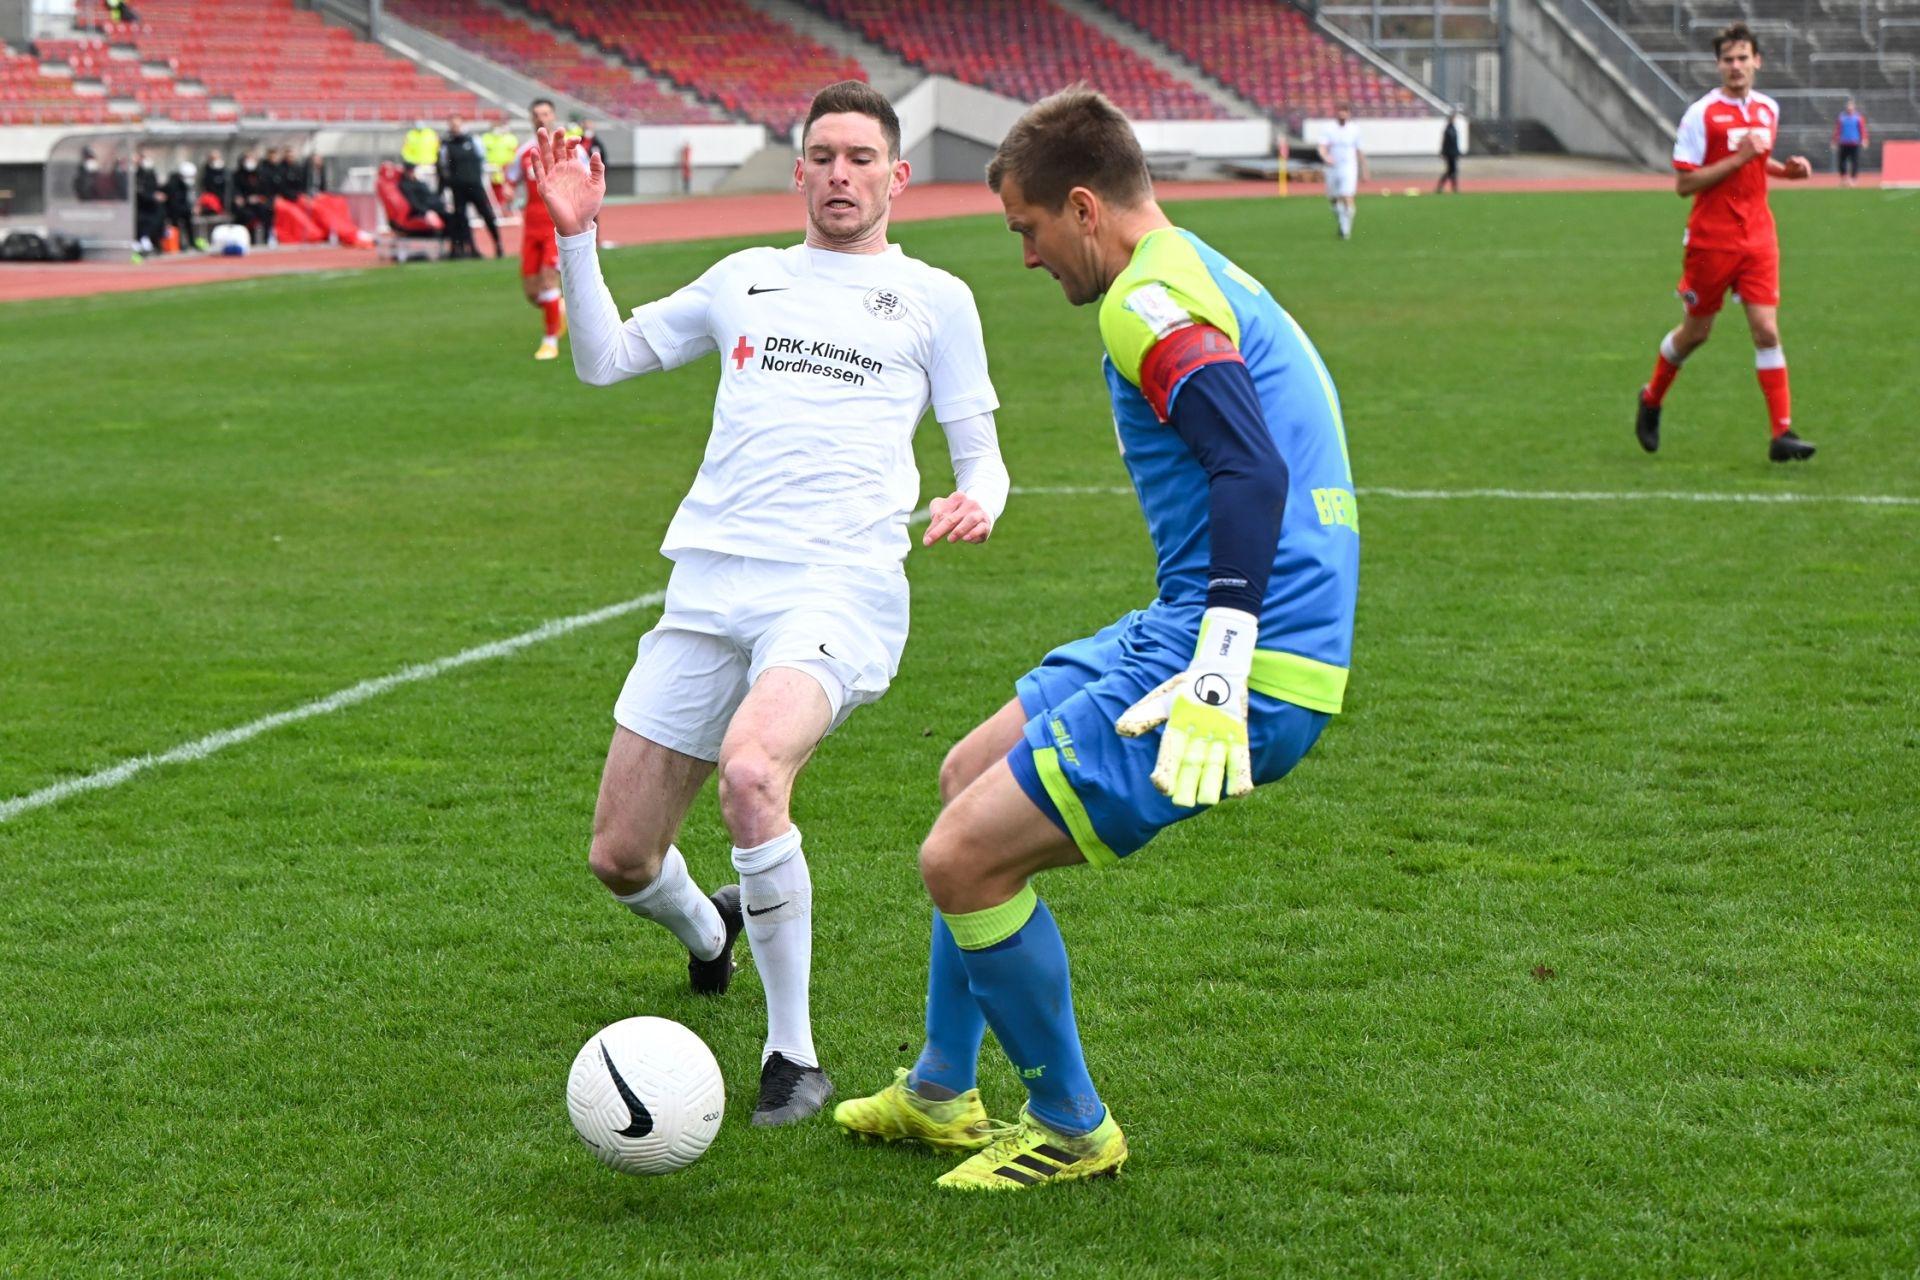 Regionalliga Südwest 2020/21, KSV Hessen Kassel, VfR Aalen, Endstand 1:1, Lukas Iksal